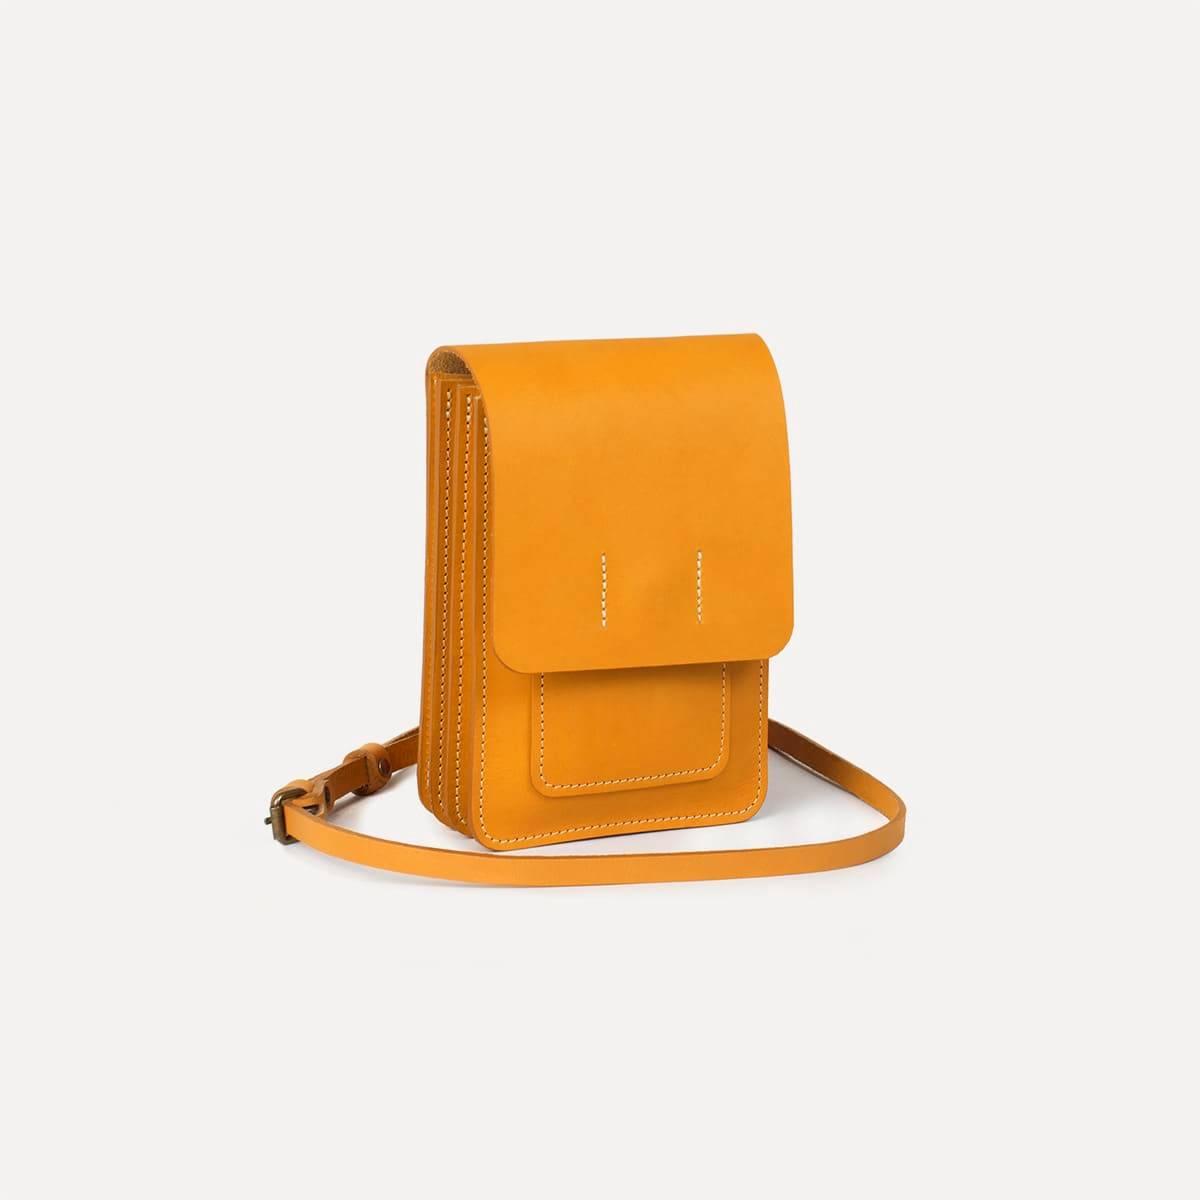 Jeweler's bag - BDC x Atelier Paulin (image n°2)